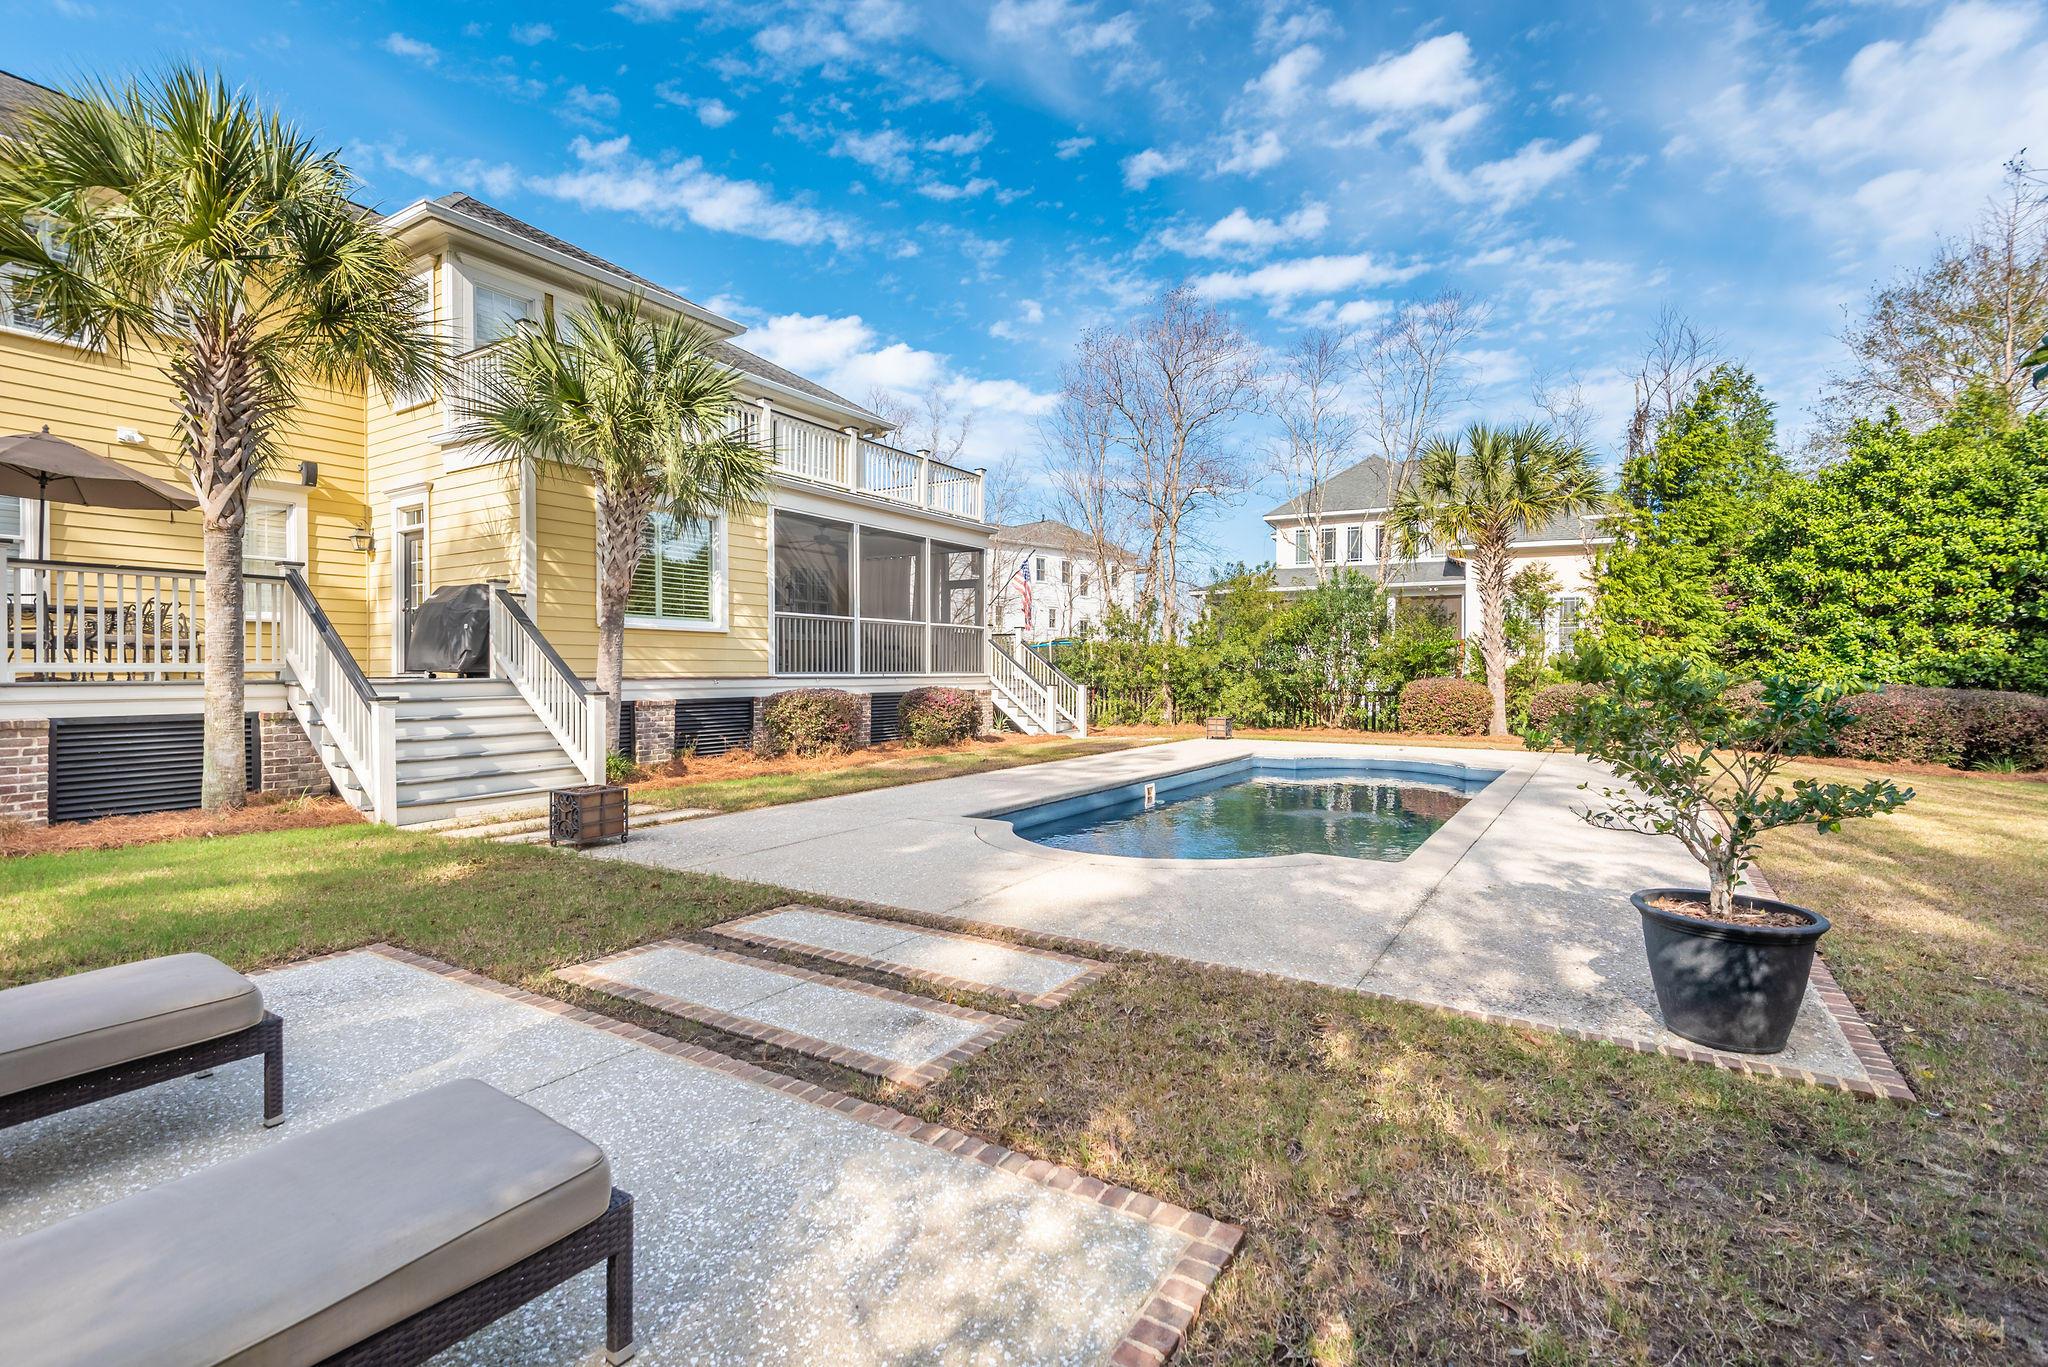 Dunes West Homes For Sale - 1305 King Bird, Mount Pleasant, SC - 19